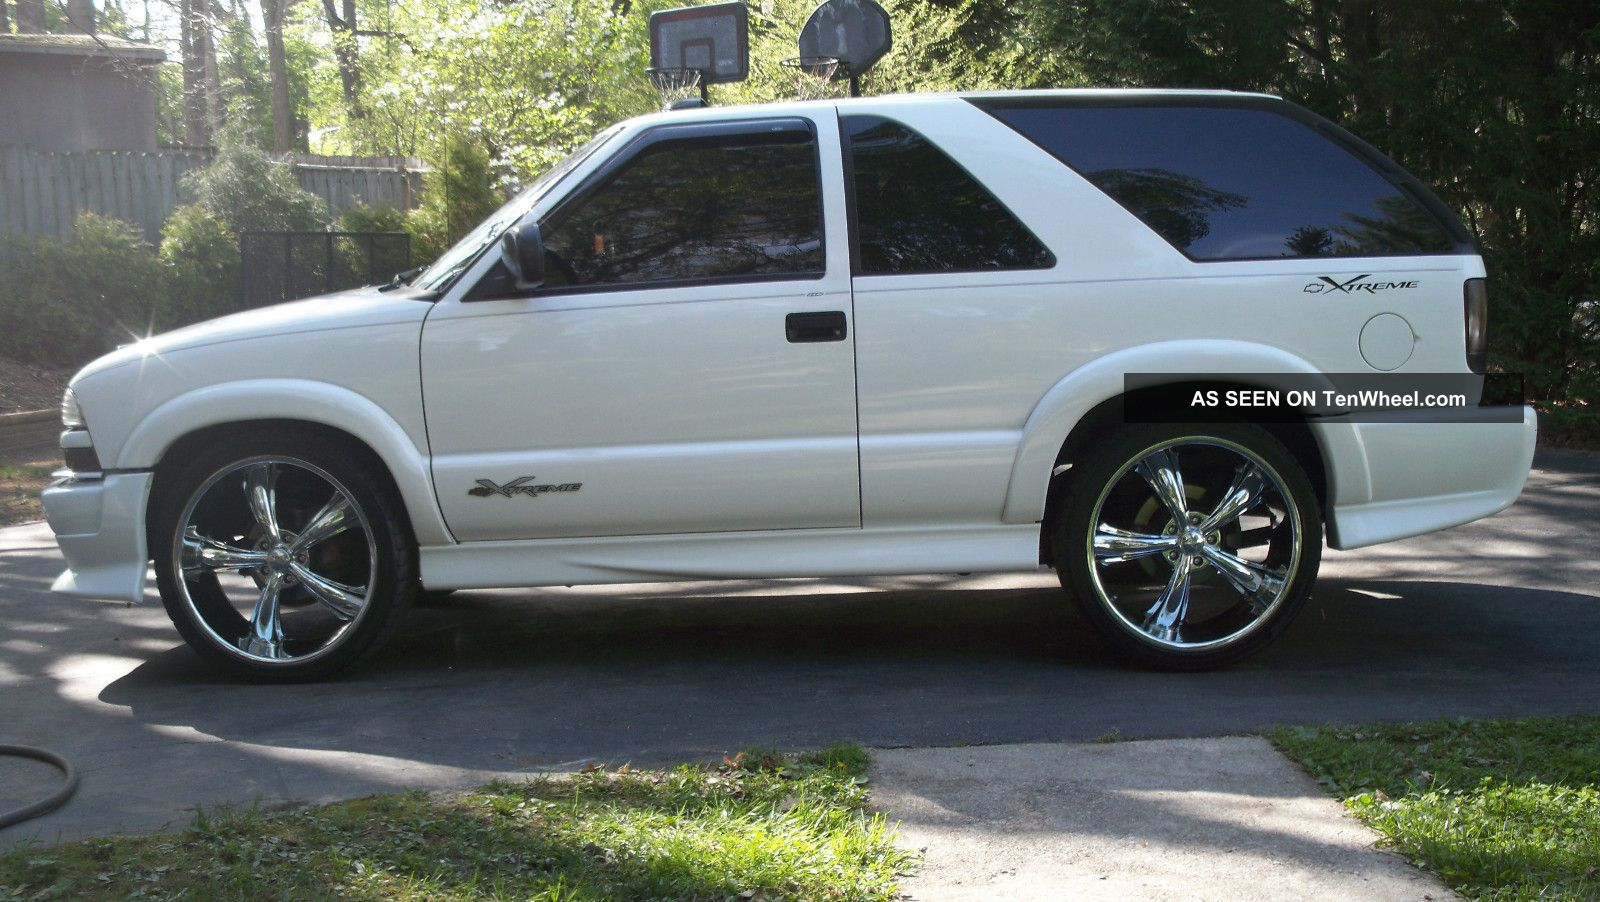 Get 2003 Chevy Blazer White